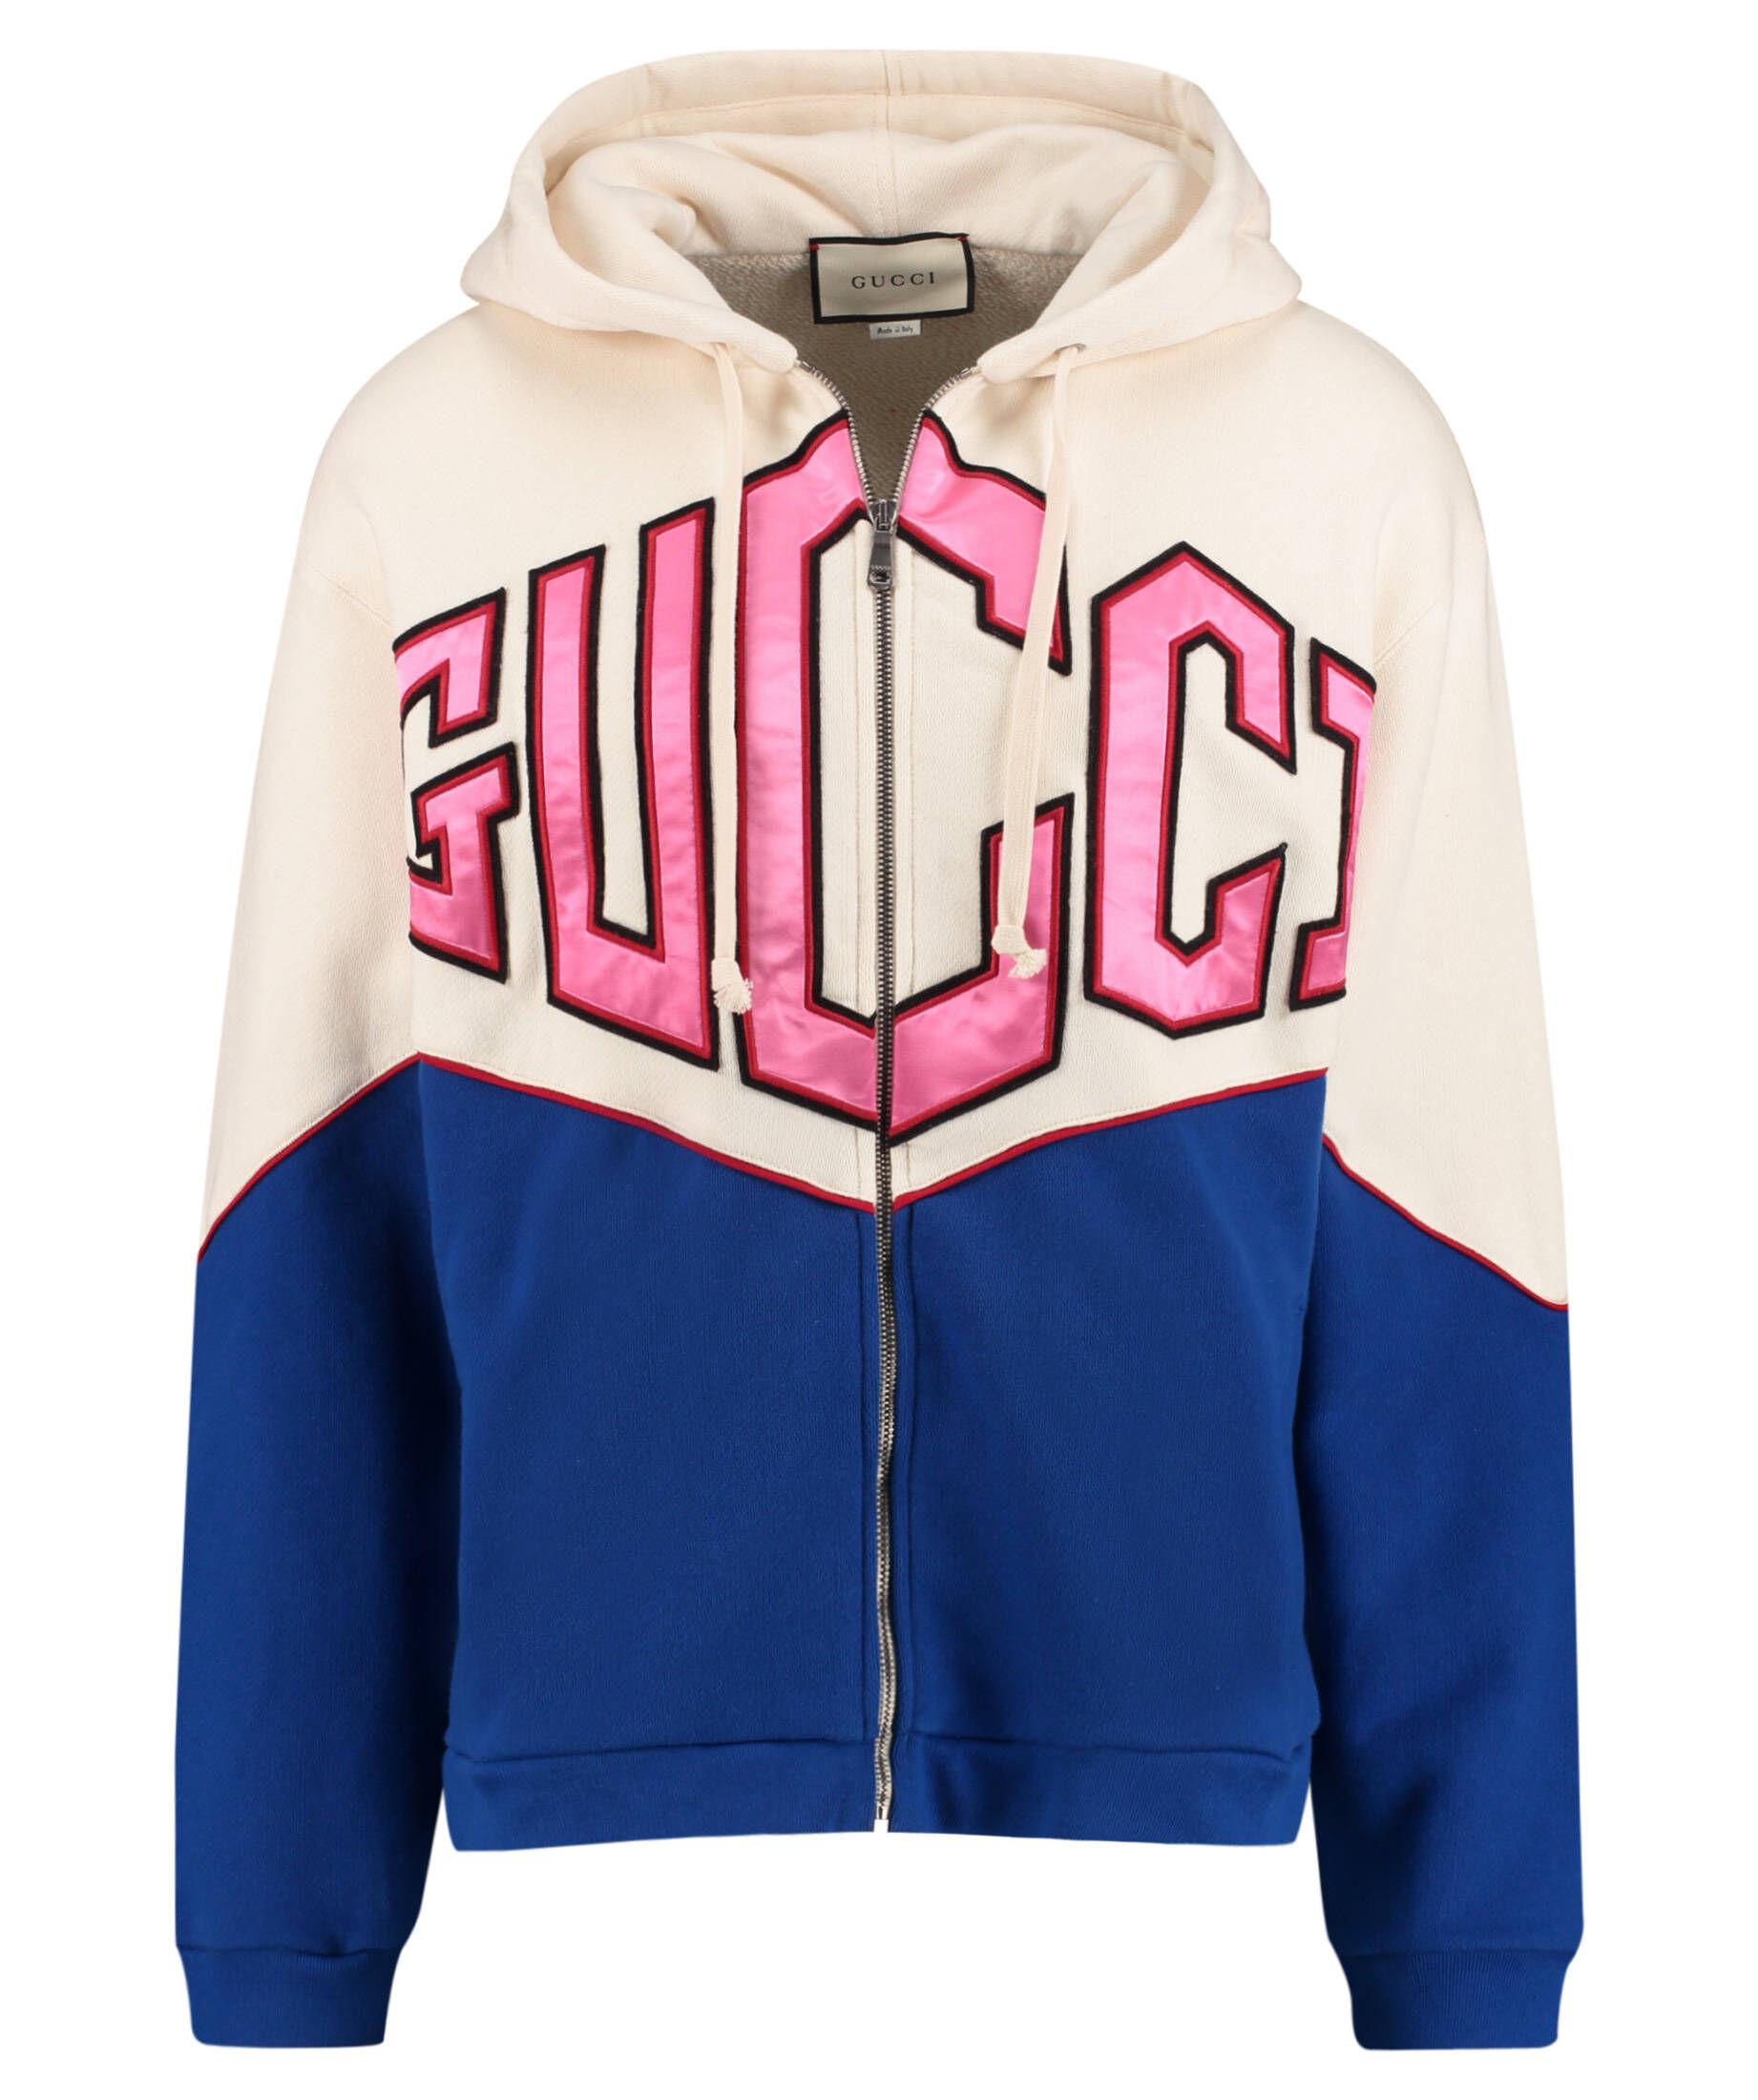 Adidas Herren Hoodie Zipper Sweatjacke pullover Blau M Neu